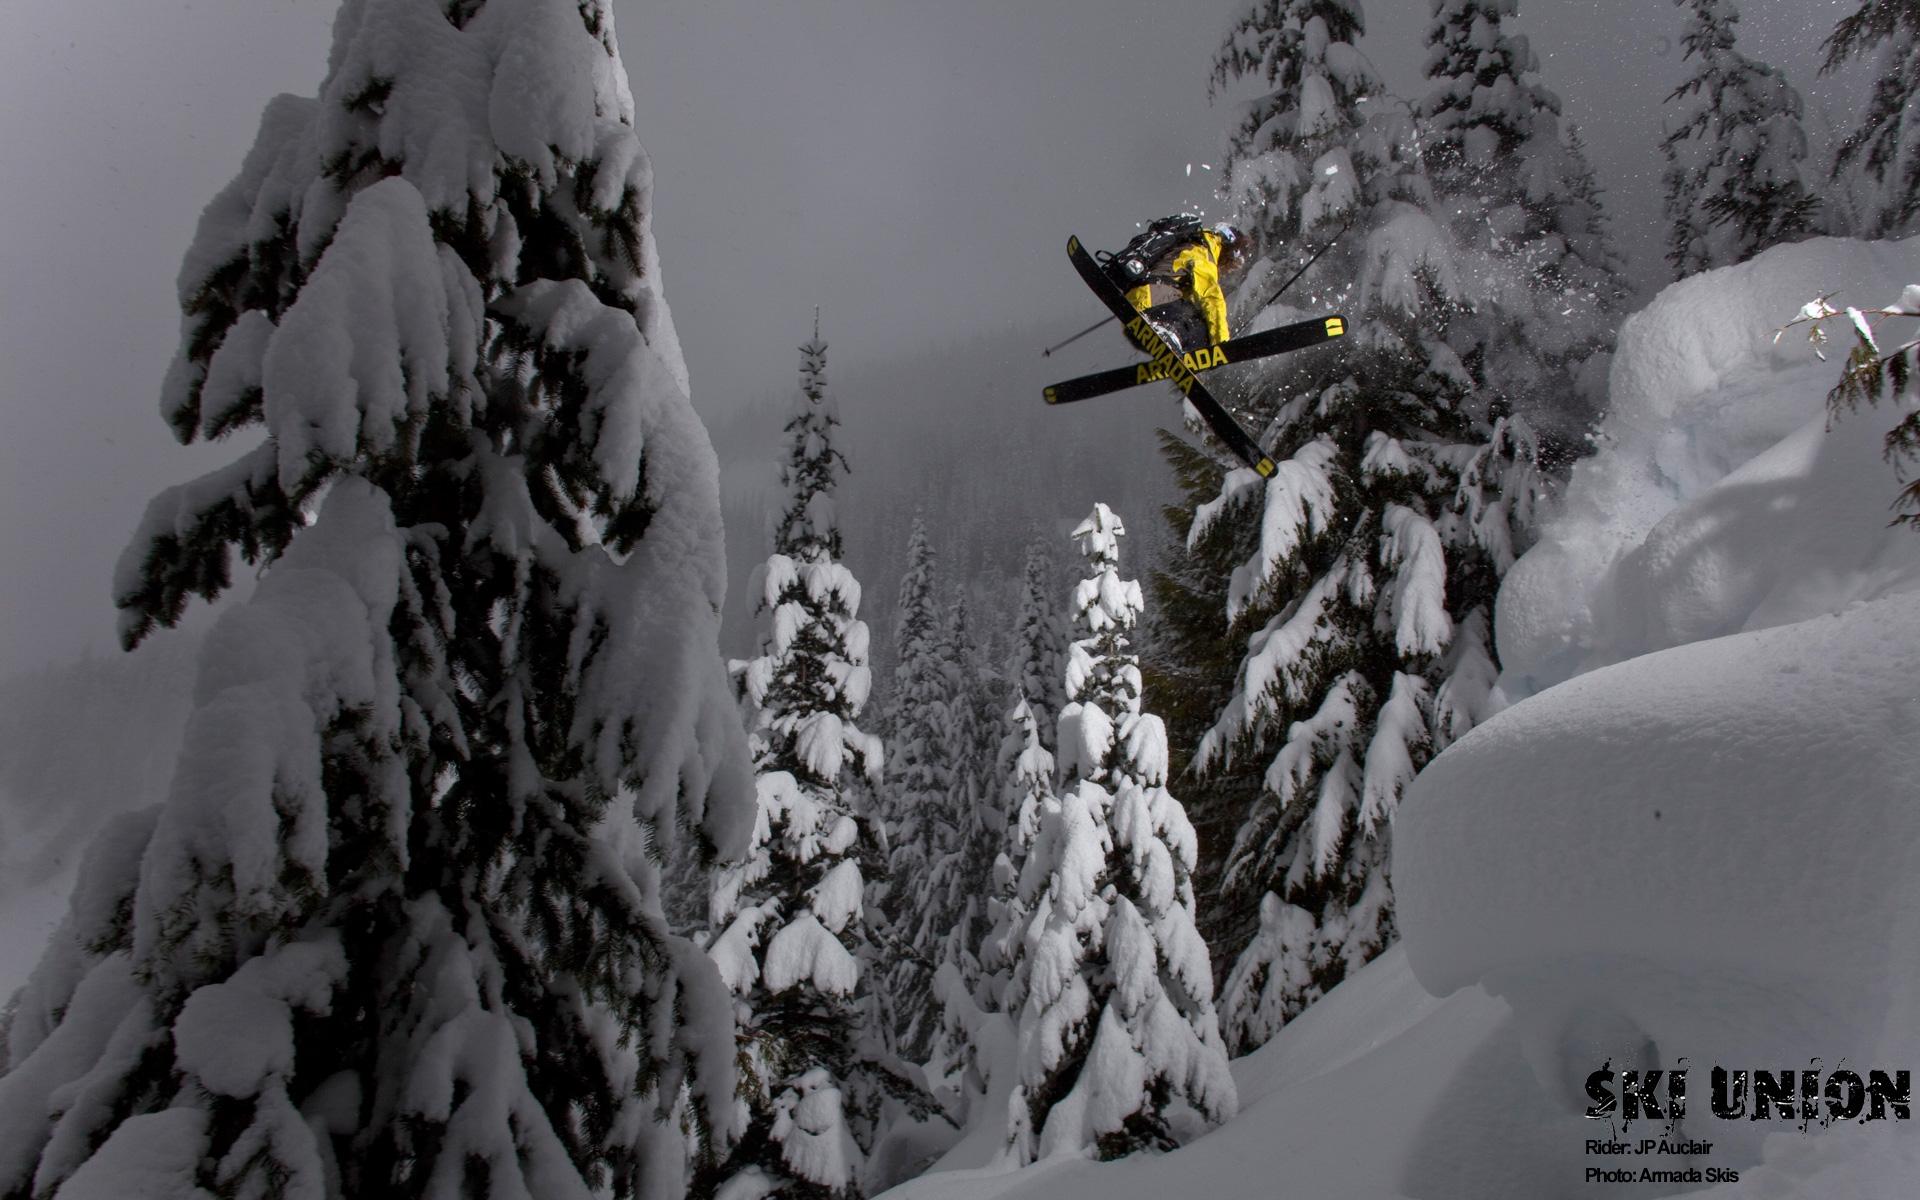 Ski Wallpaper JP Auclair 1920x1200